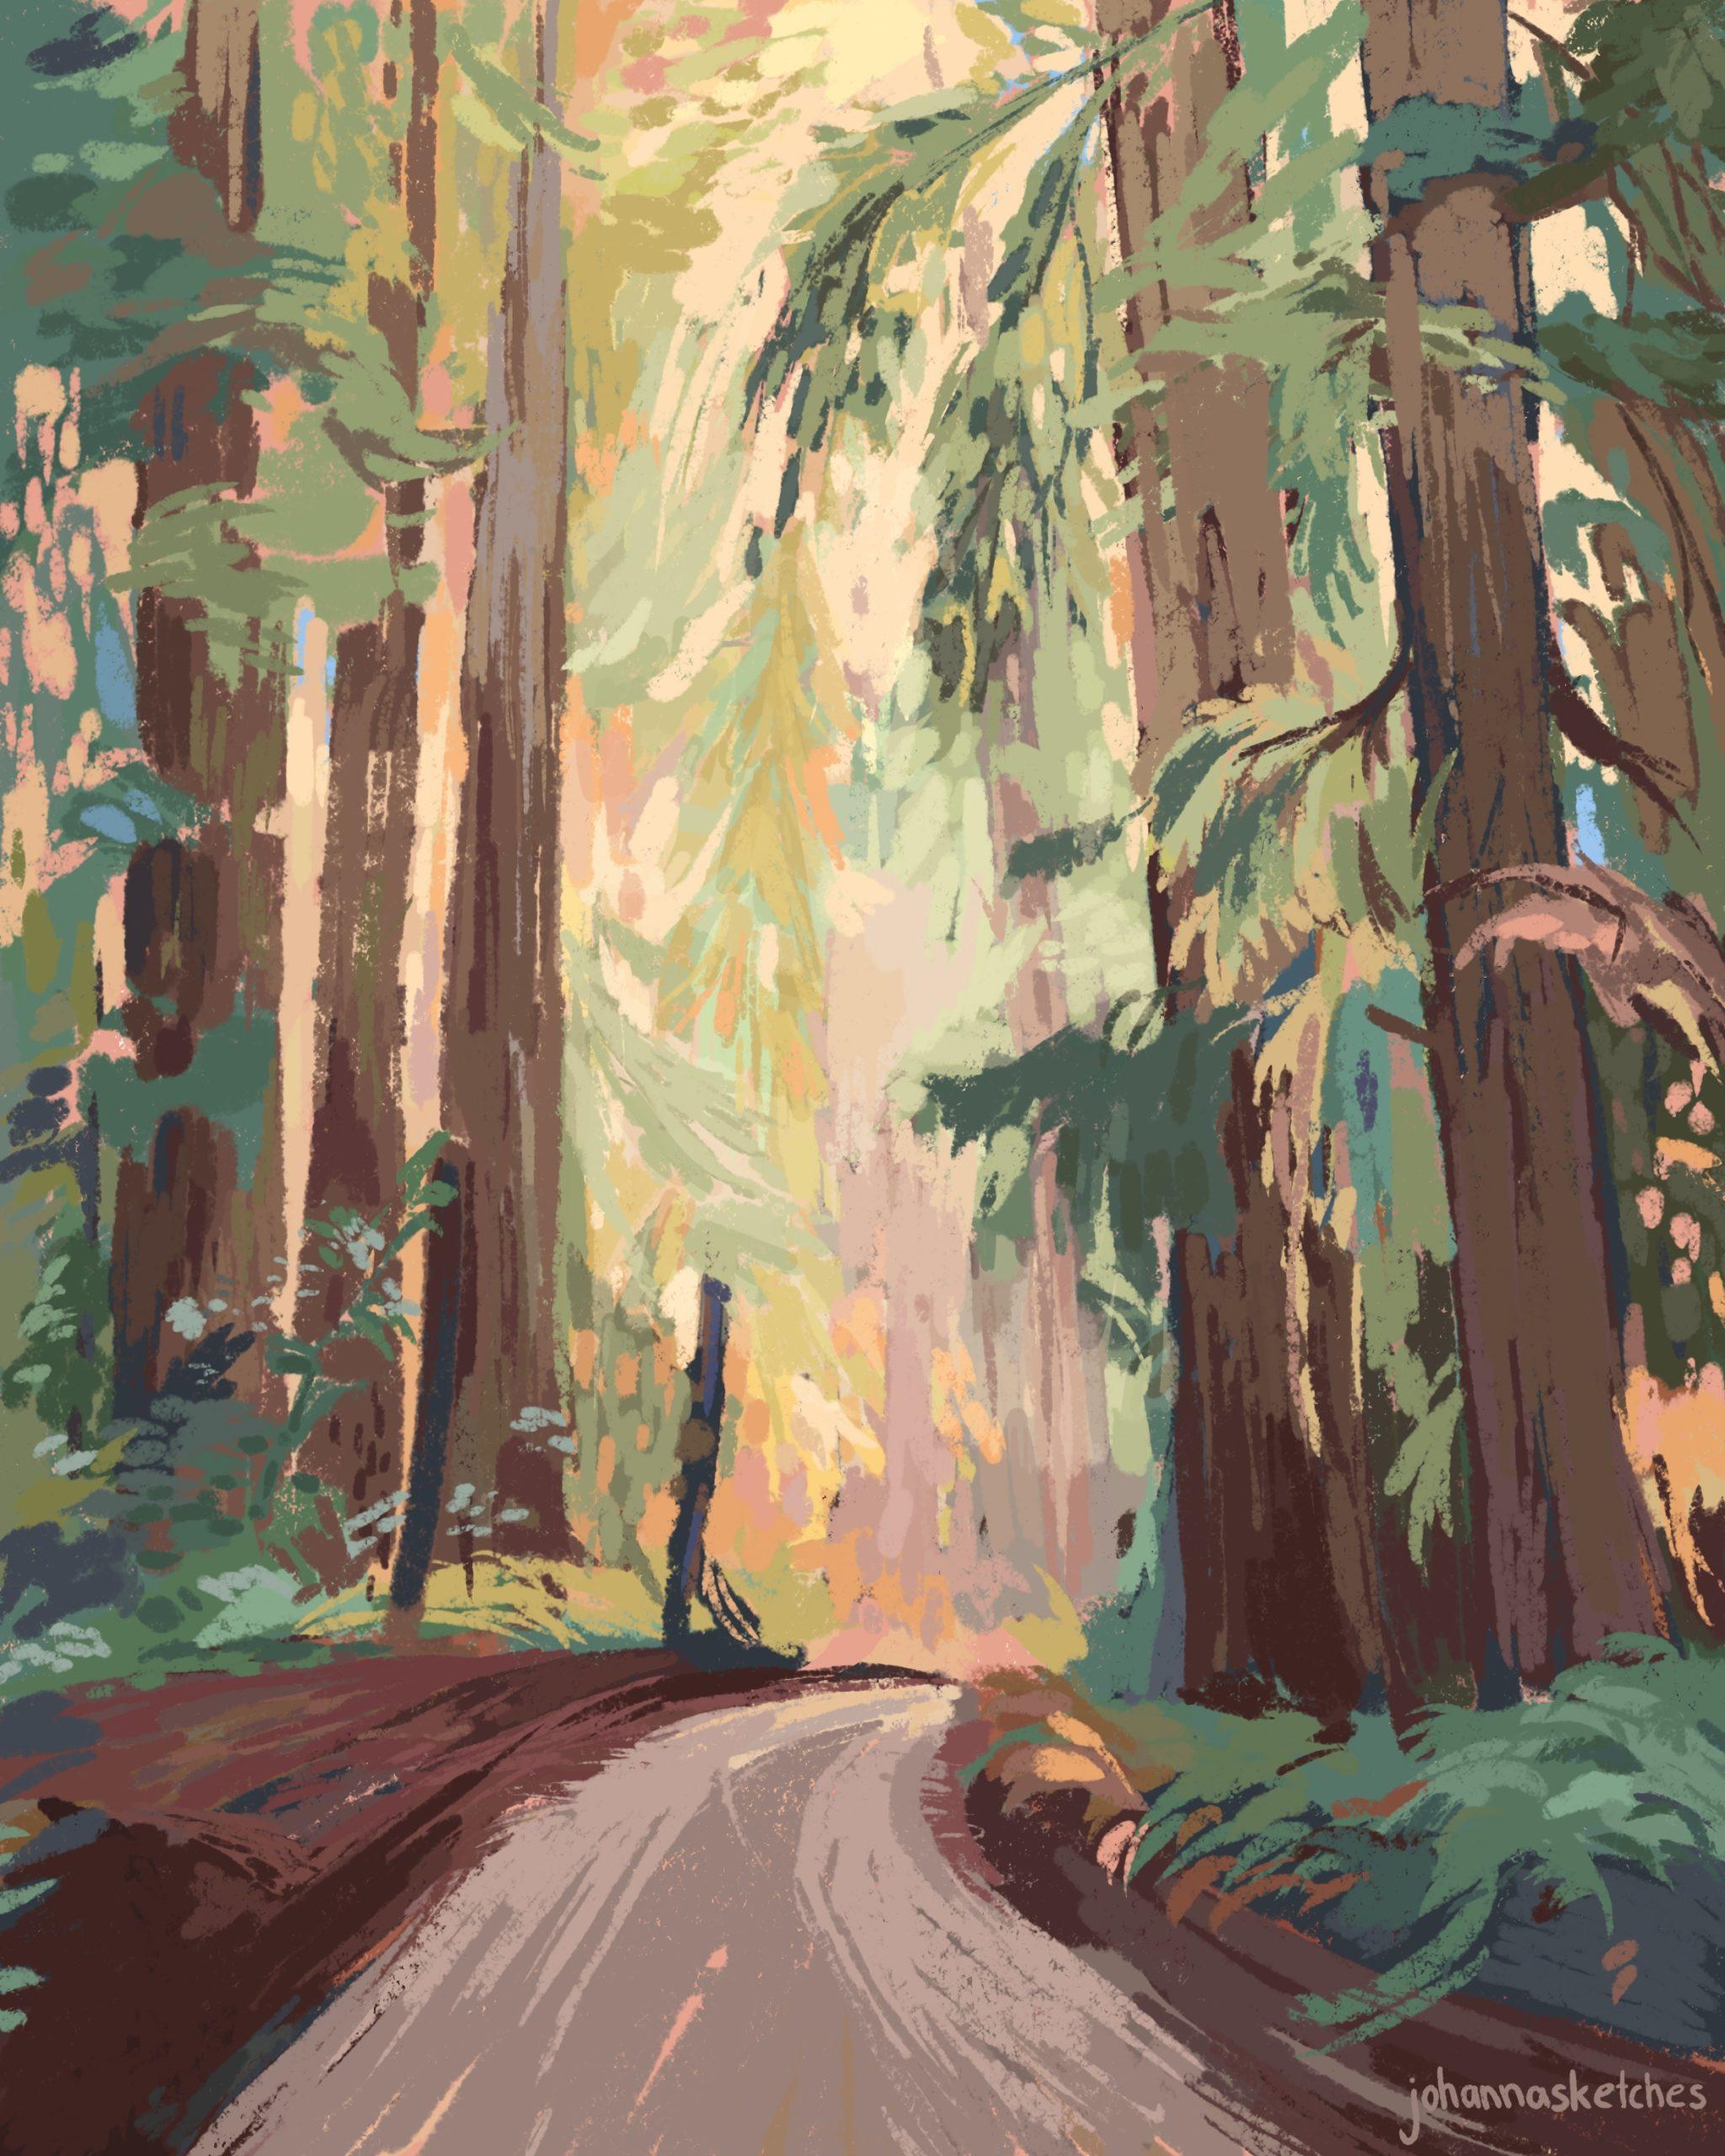 Wald (digita9